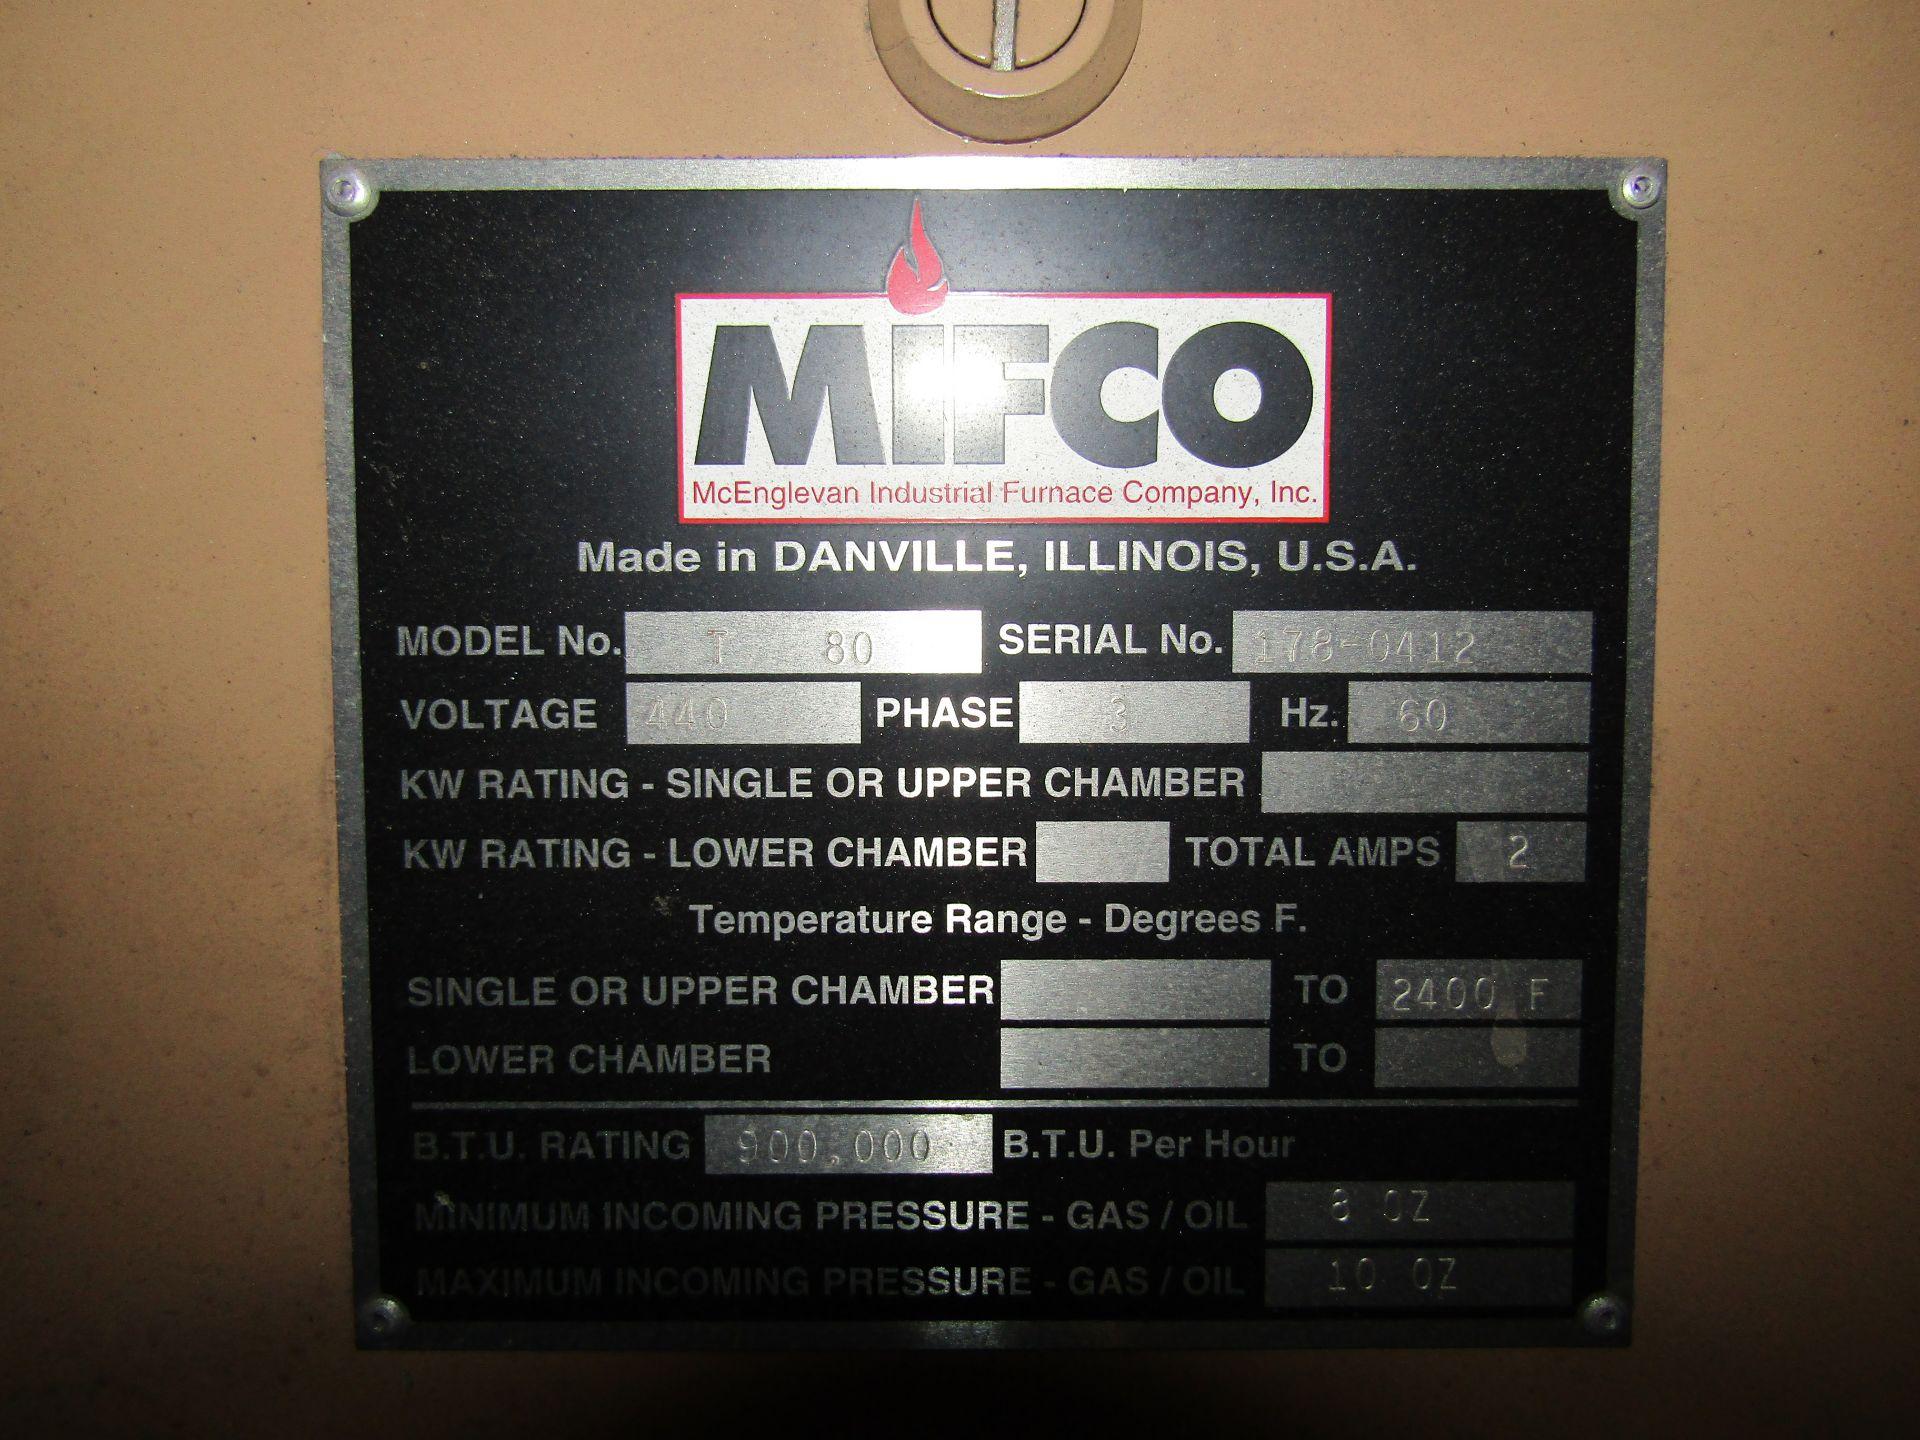 Lot 17 - MIFCO T-80 Gas Furnace, S/N 178-0412, 440 V, 3 Phase, 60 HZ, 900,000 BTU